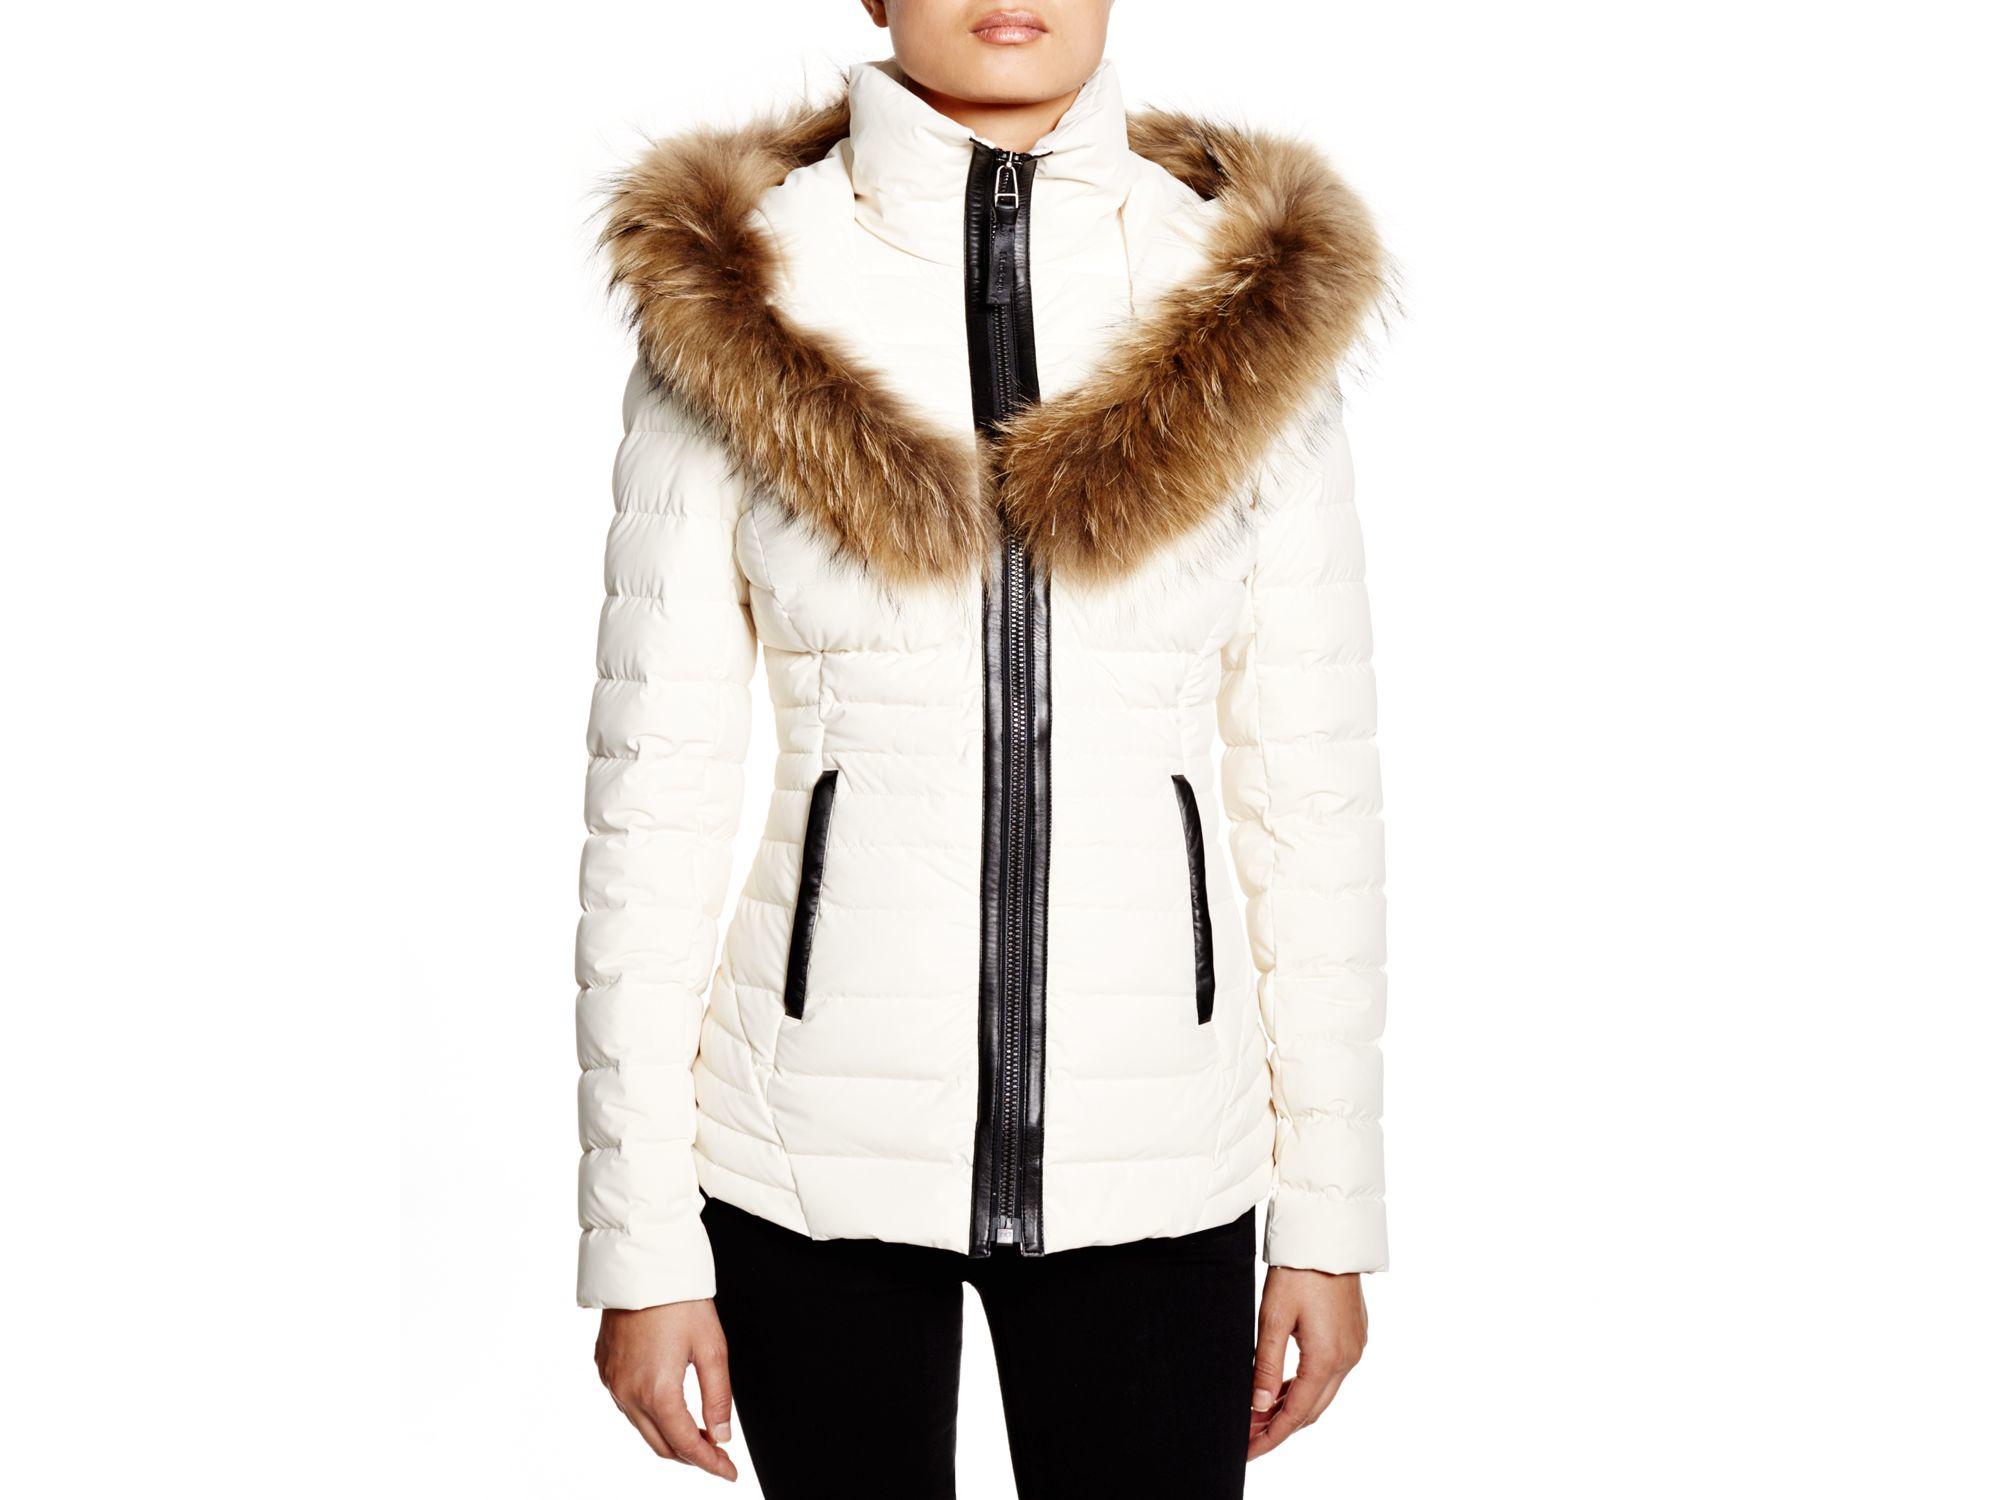 Mackage Adalina Jacket With Raccoon Fur Trim in White | Lyst